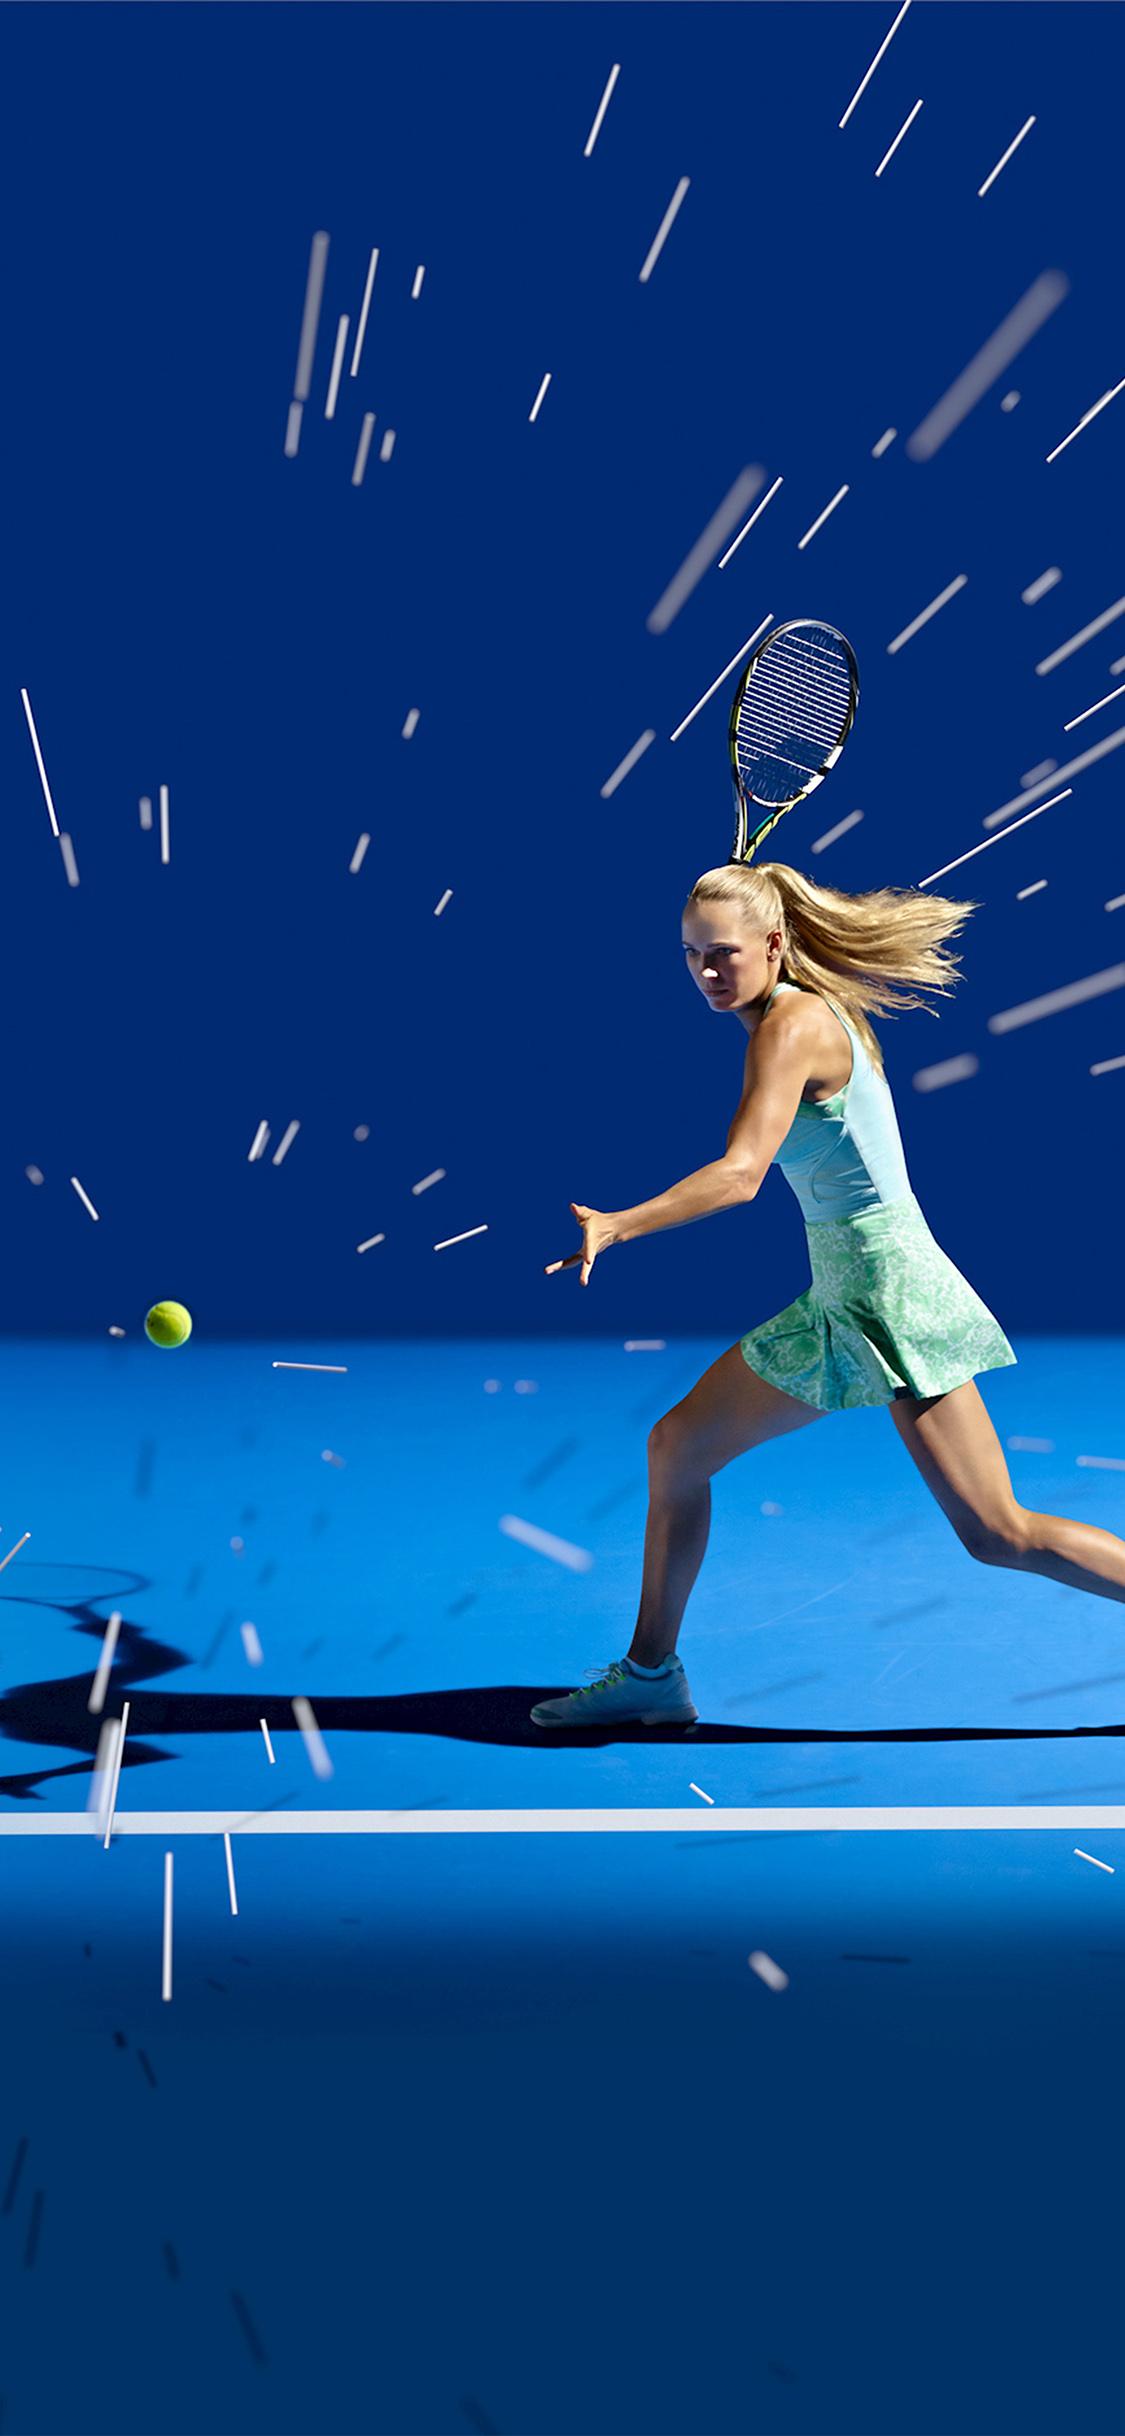 iPhoneXpapers.com-Apple-iPhone-wallpaper-ay17-tennis-girl-blue-sports-illustration-art